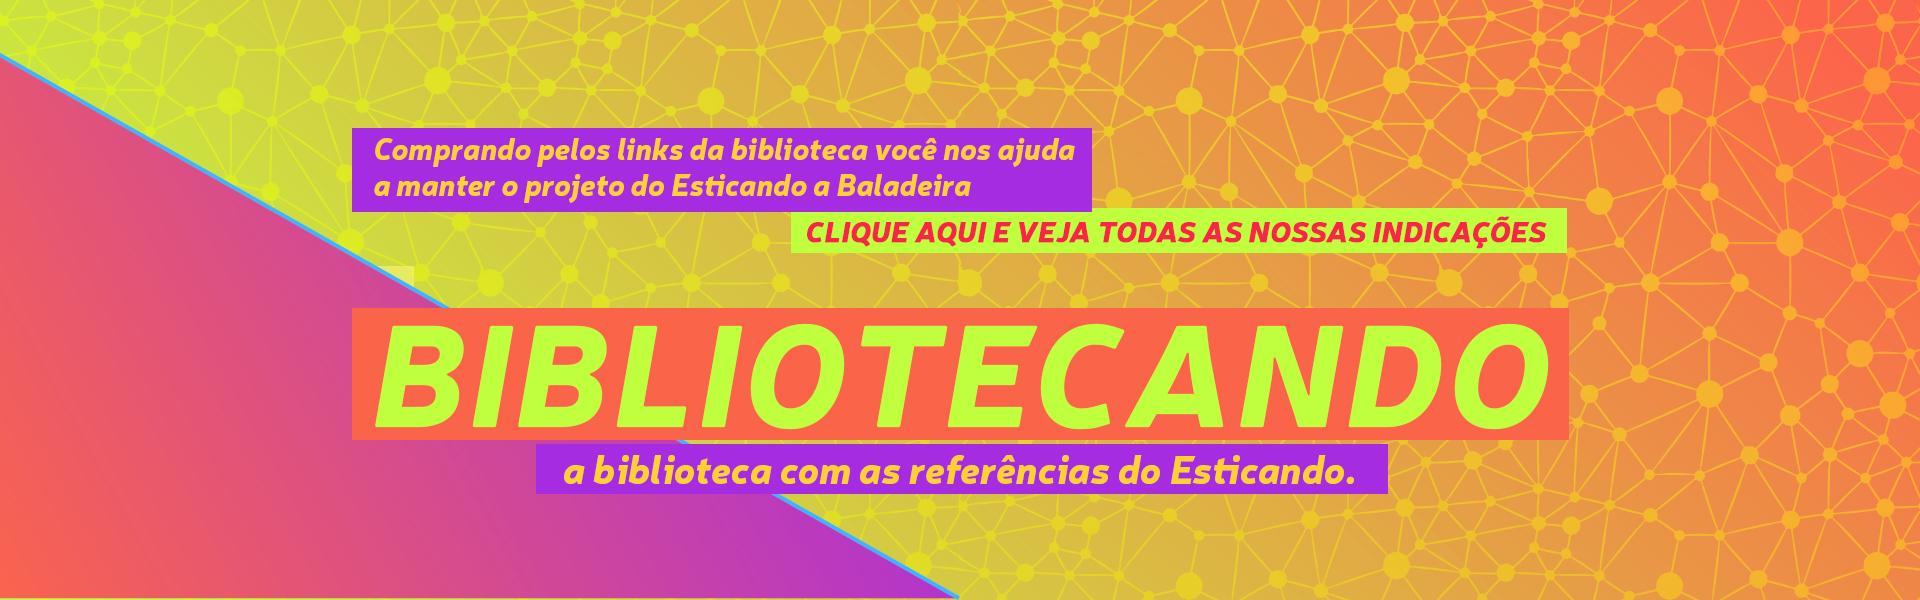 Banner_EsticandoaBaladeira_bibliotecando